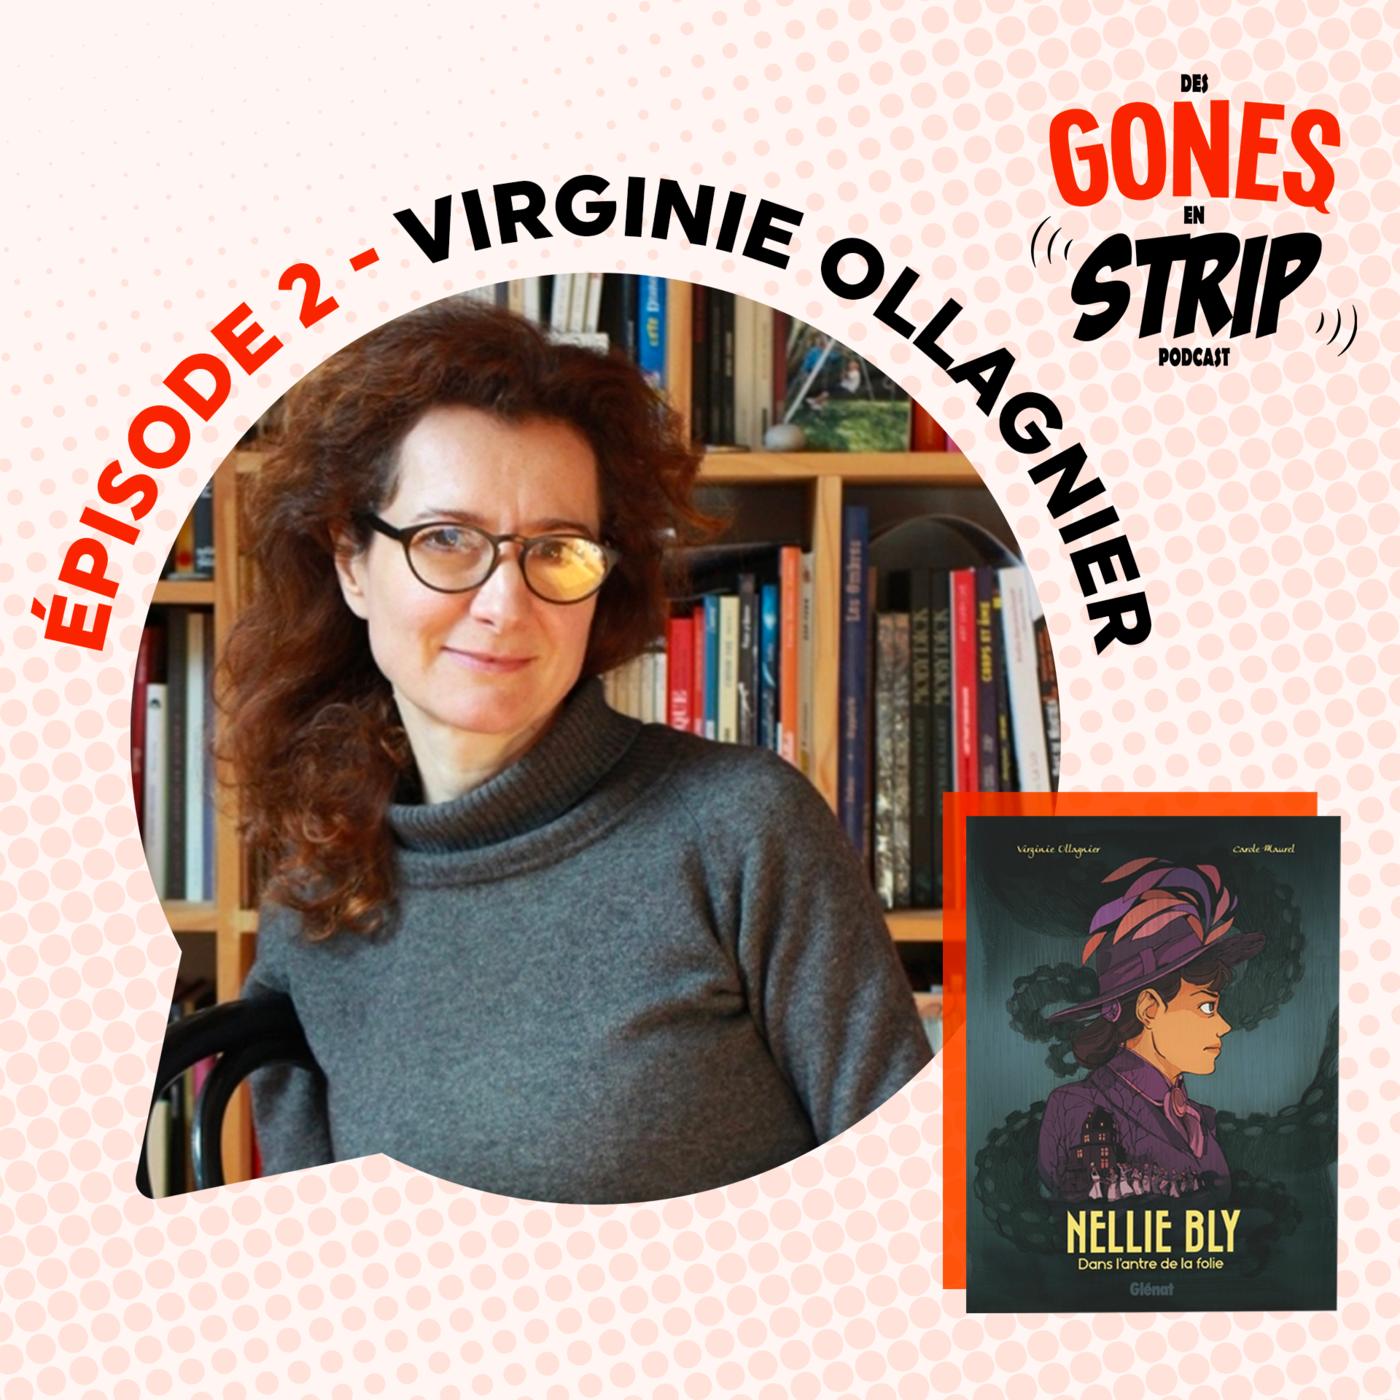 #2 - Virginie Ollagnier